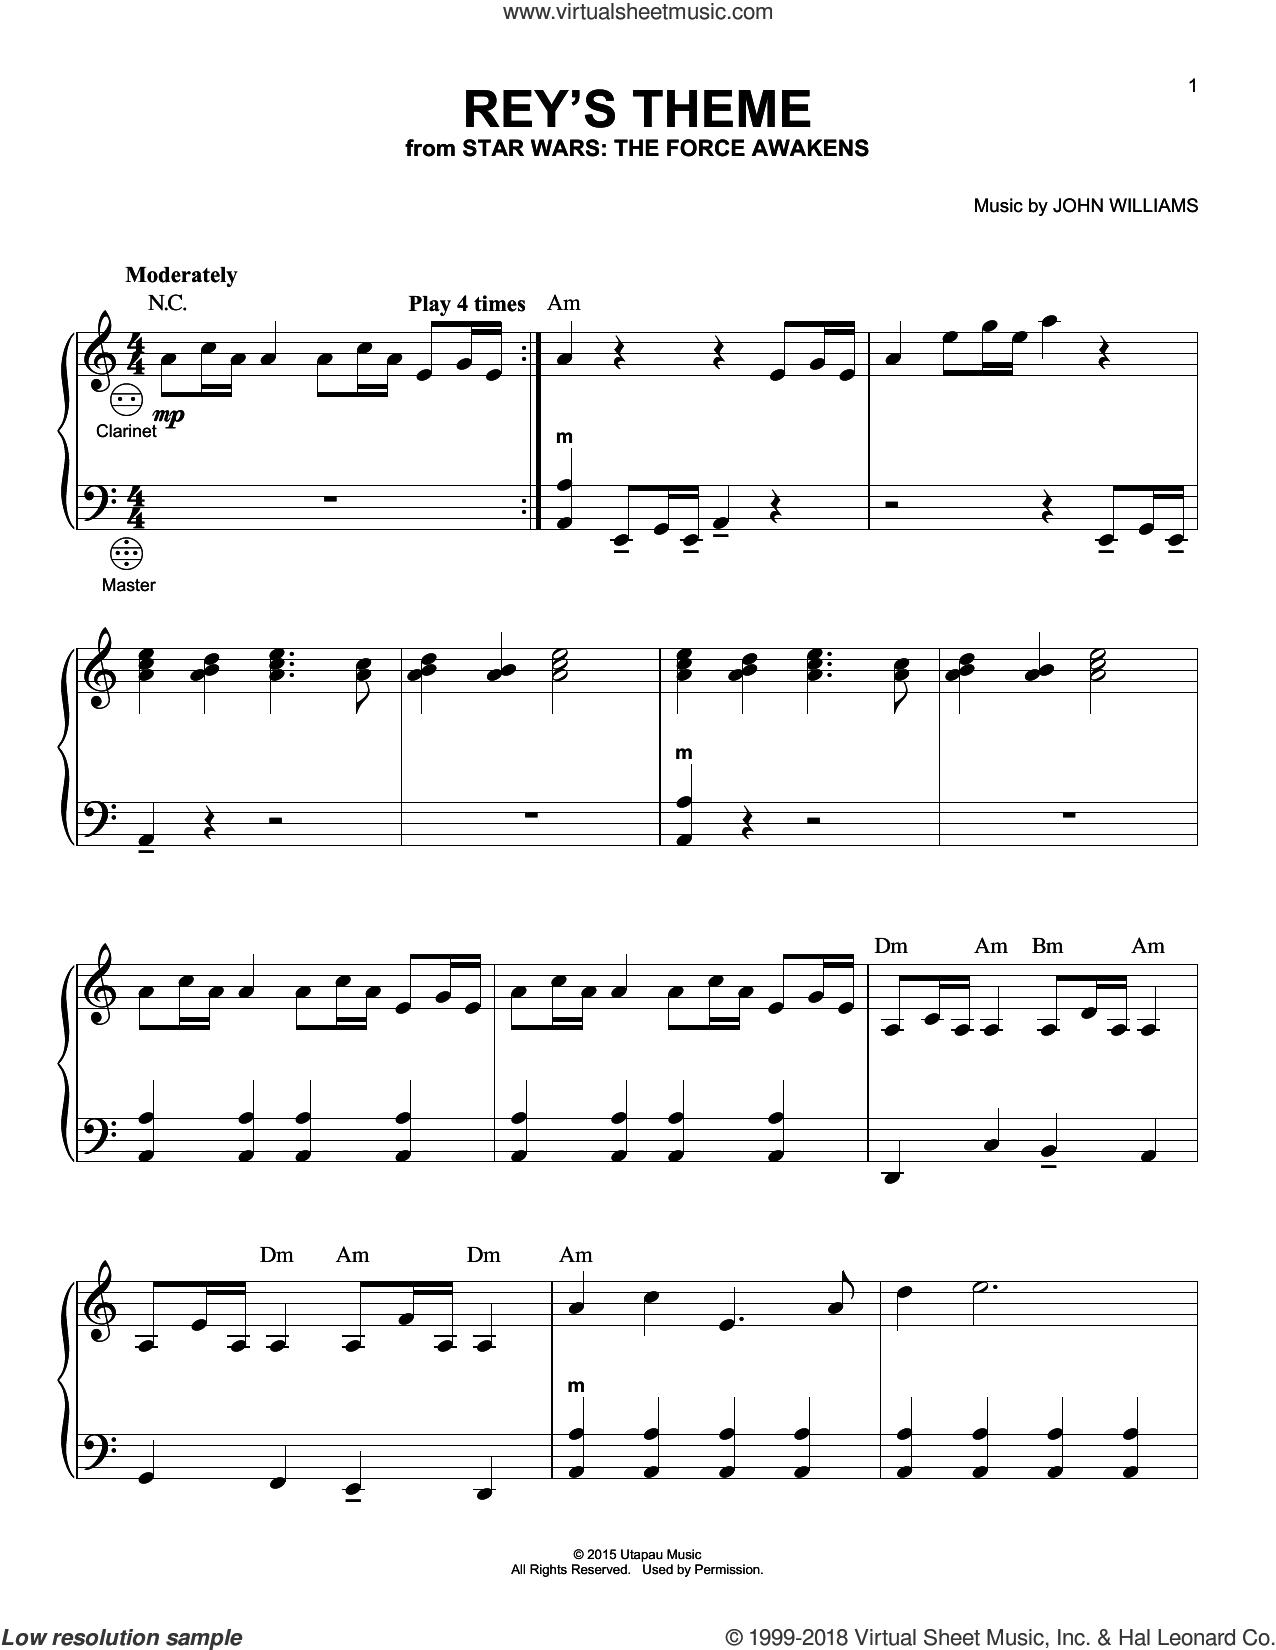 Rey's Theme sheet music for accordion by John Williams, intermediate skill level